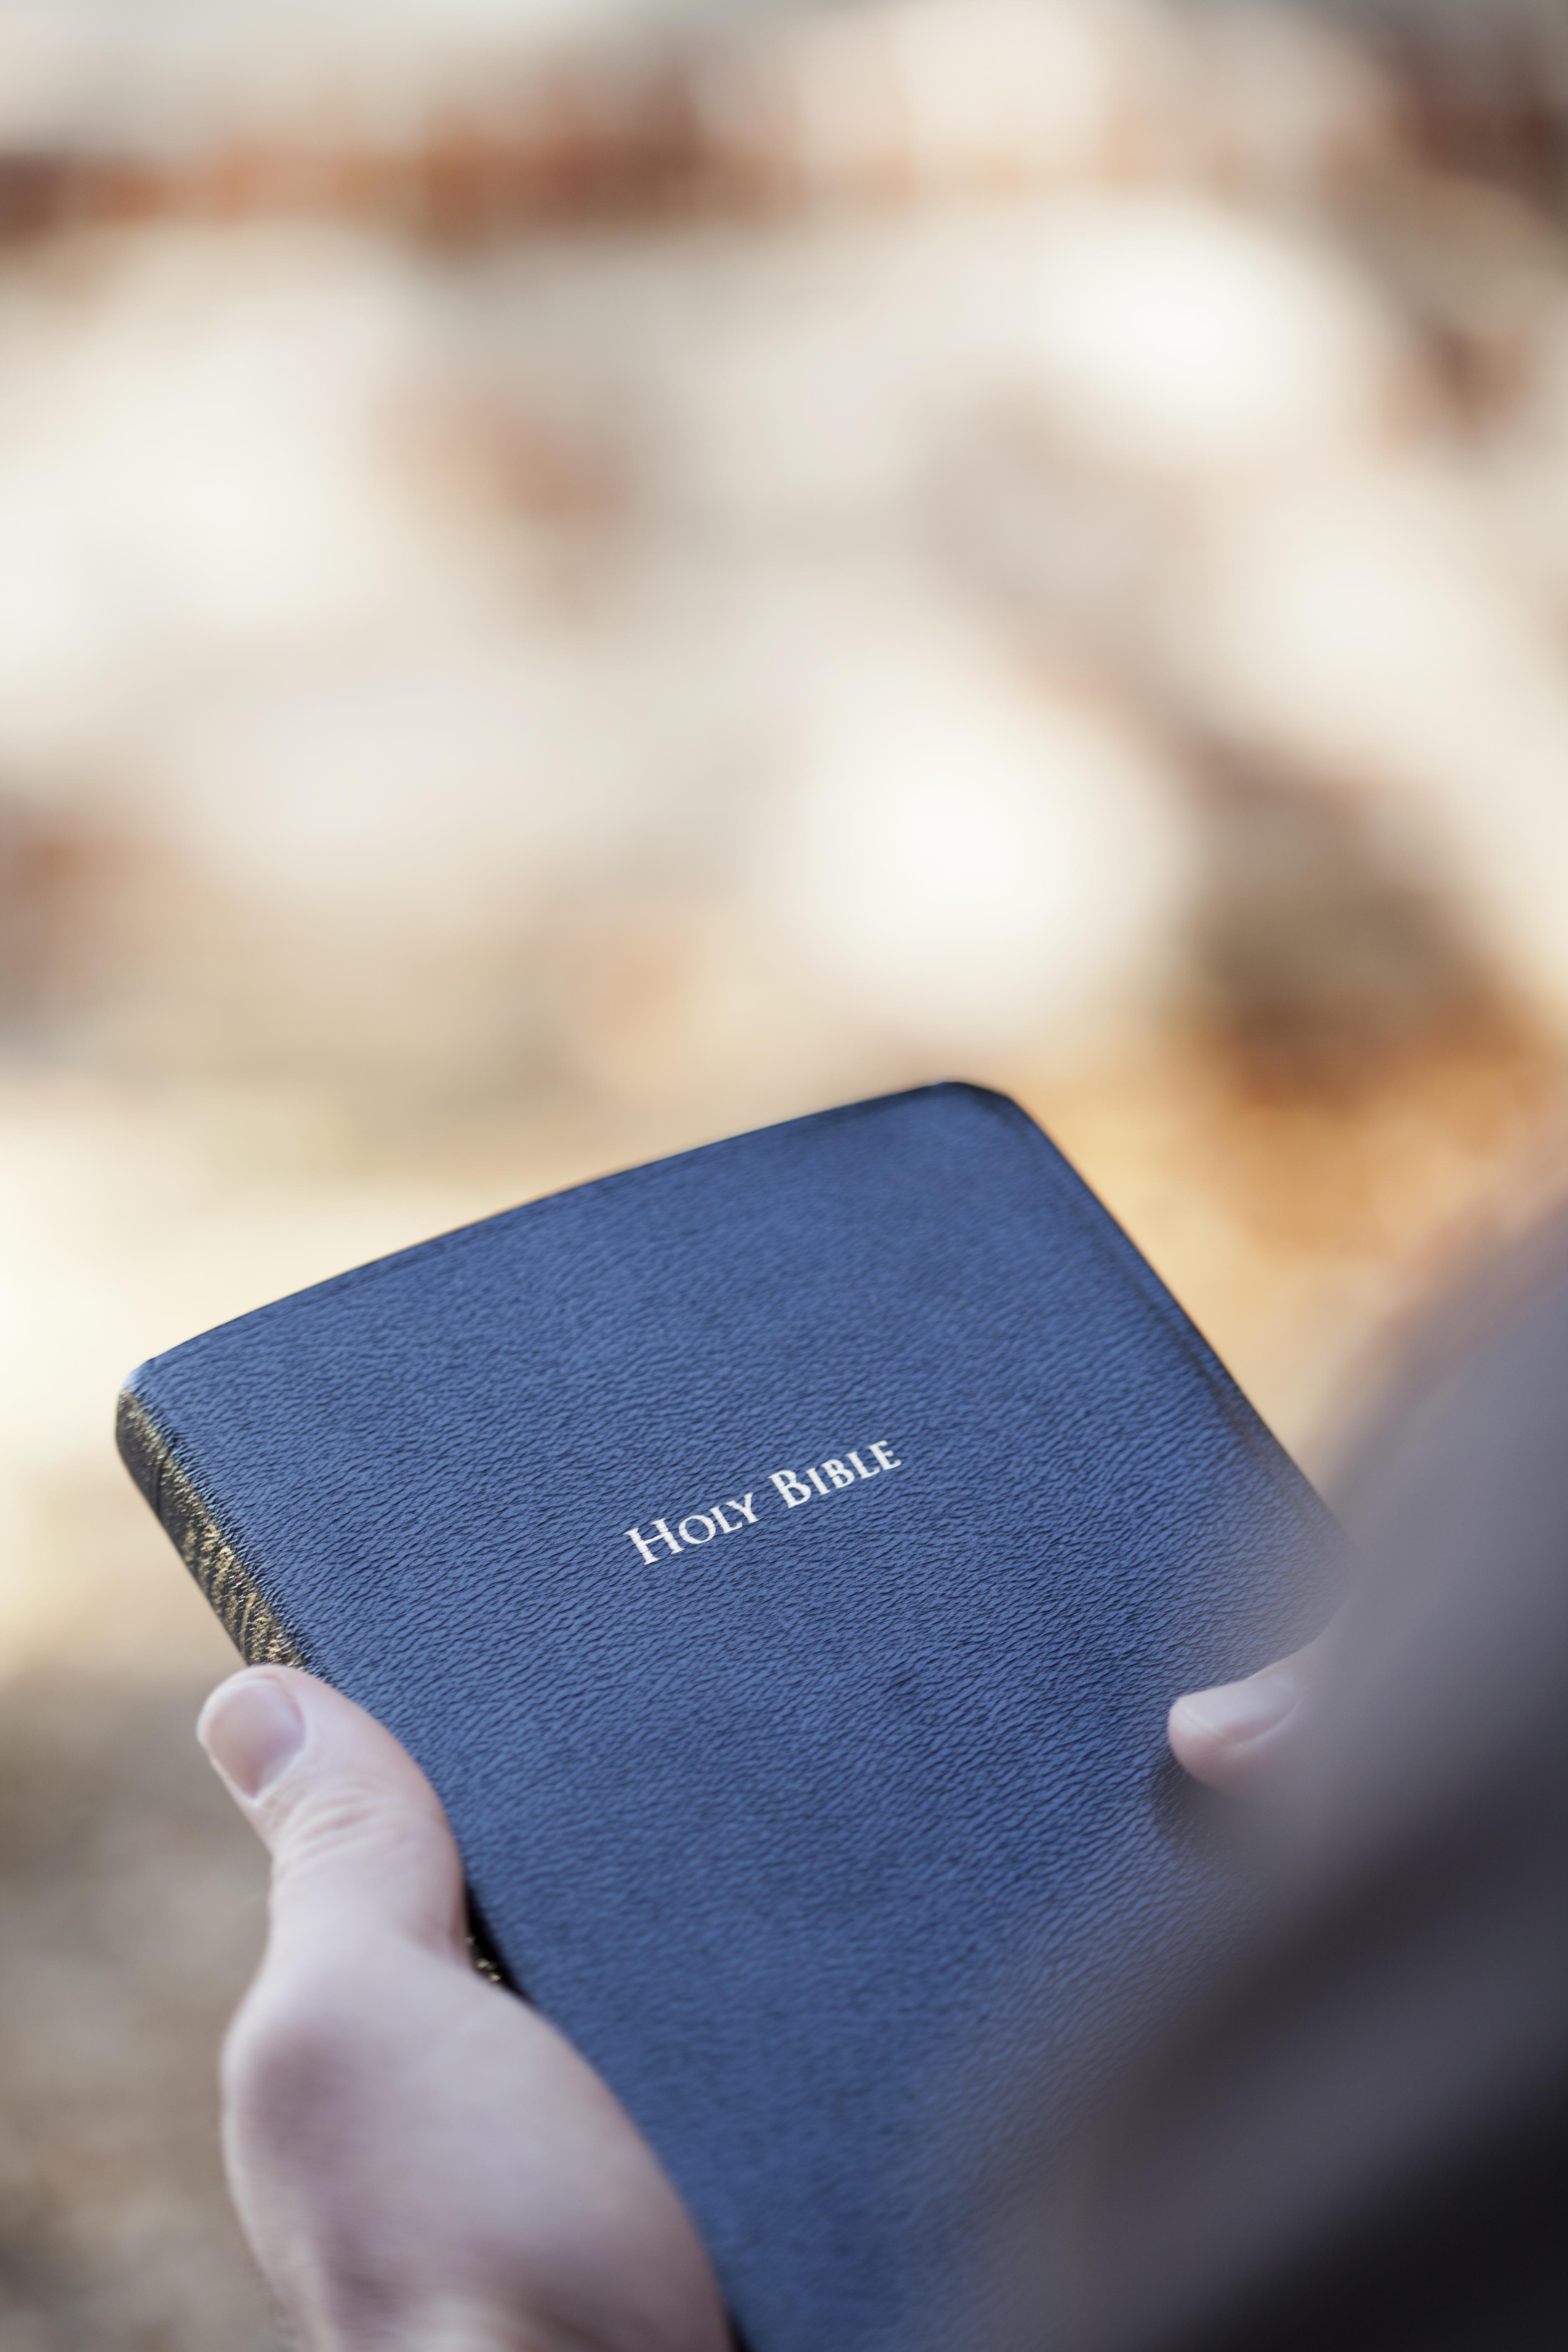 Christian dating bible between legs